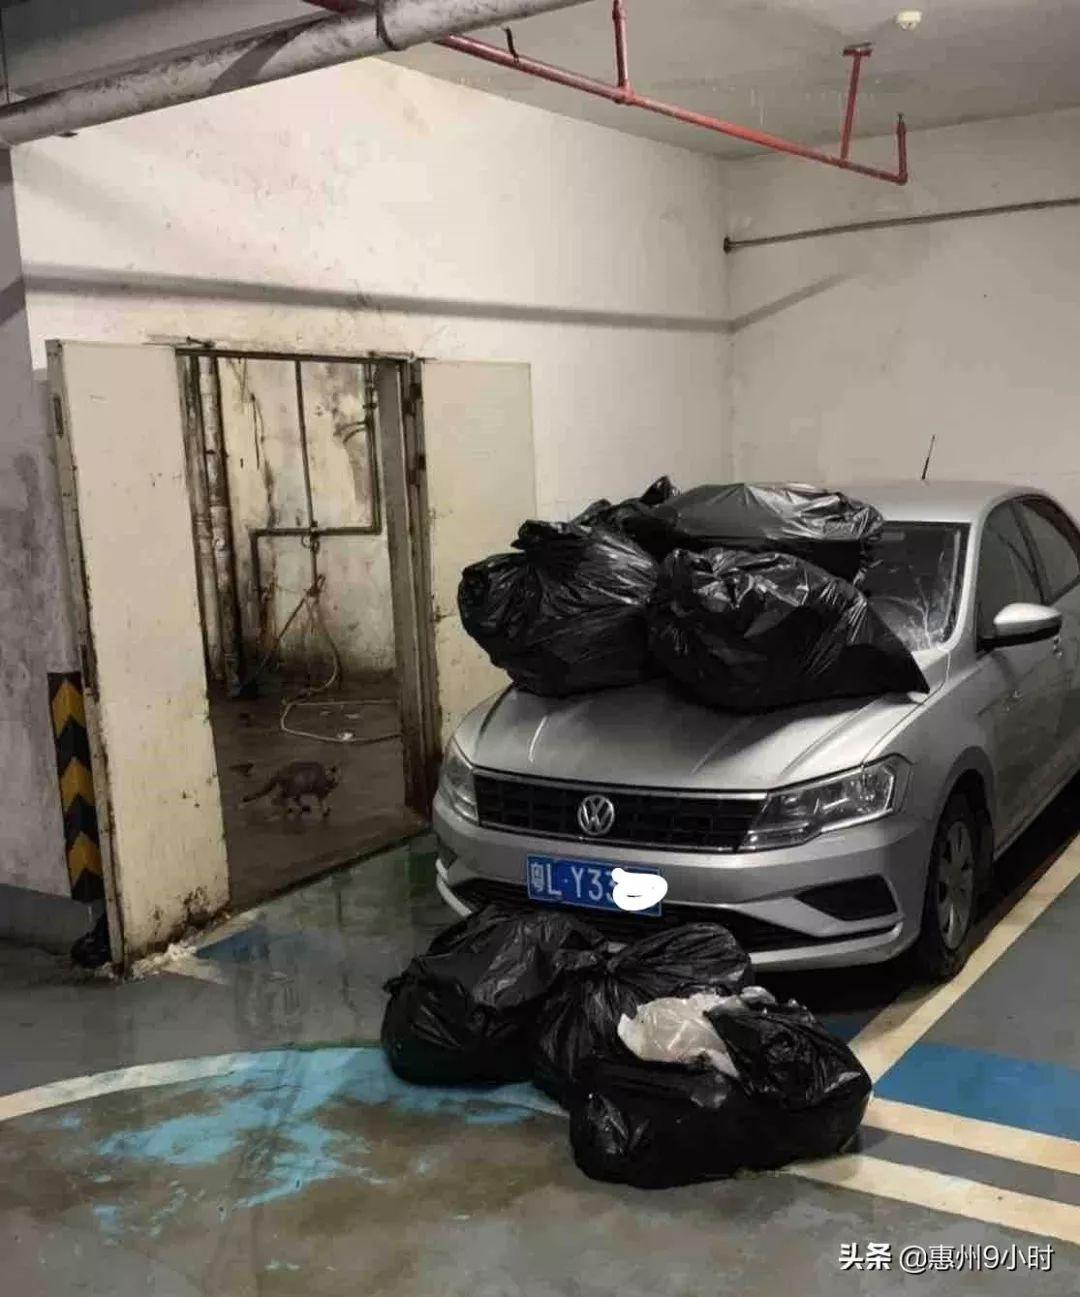 <b>惠州一轿车被垃圾桶围堵,原来是随意停车惹怒了别人</b>